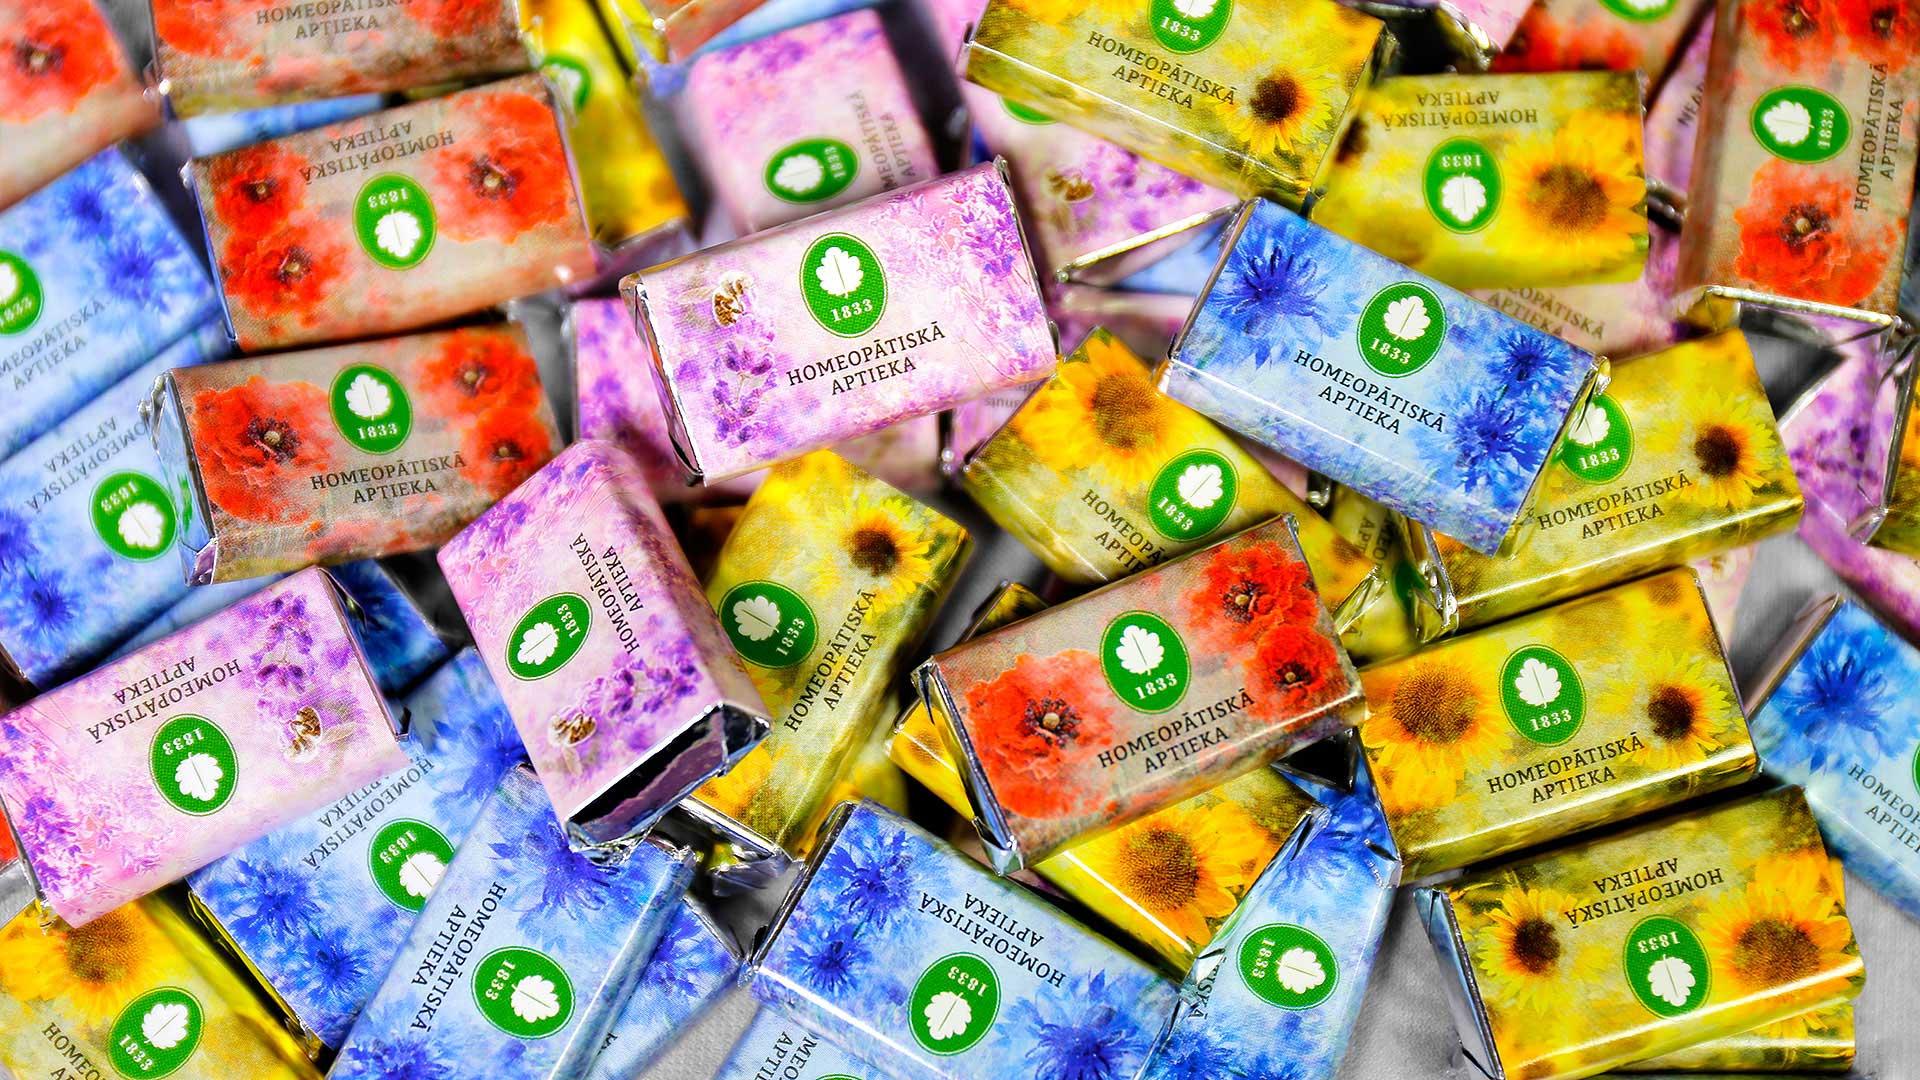 iepakojumi-konfektem-homeopatiska-aptieka